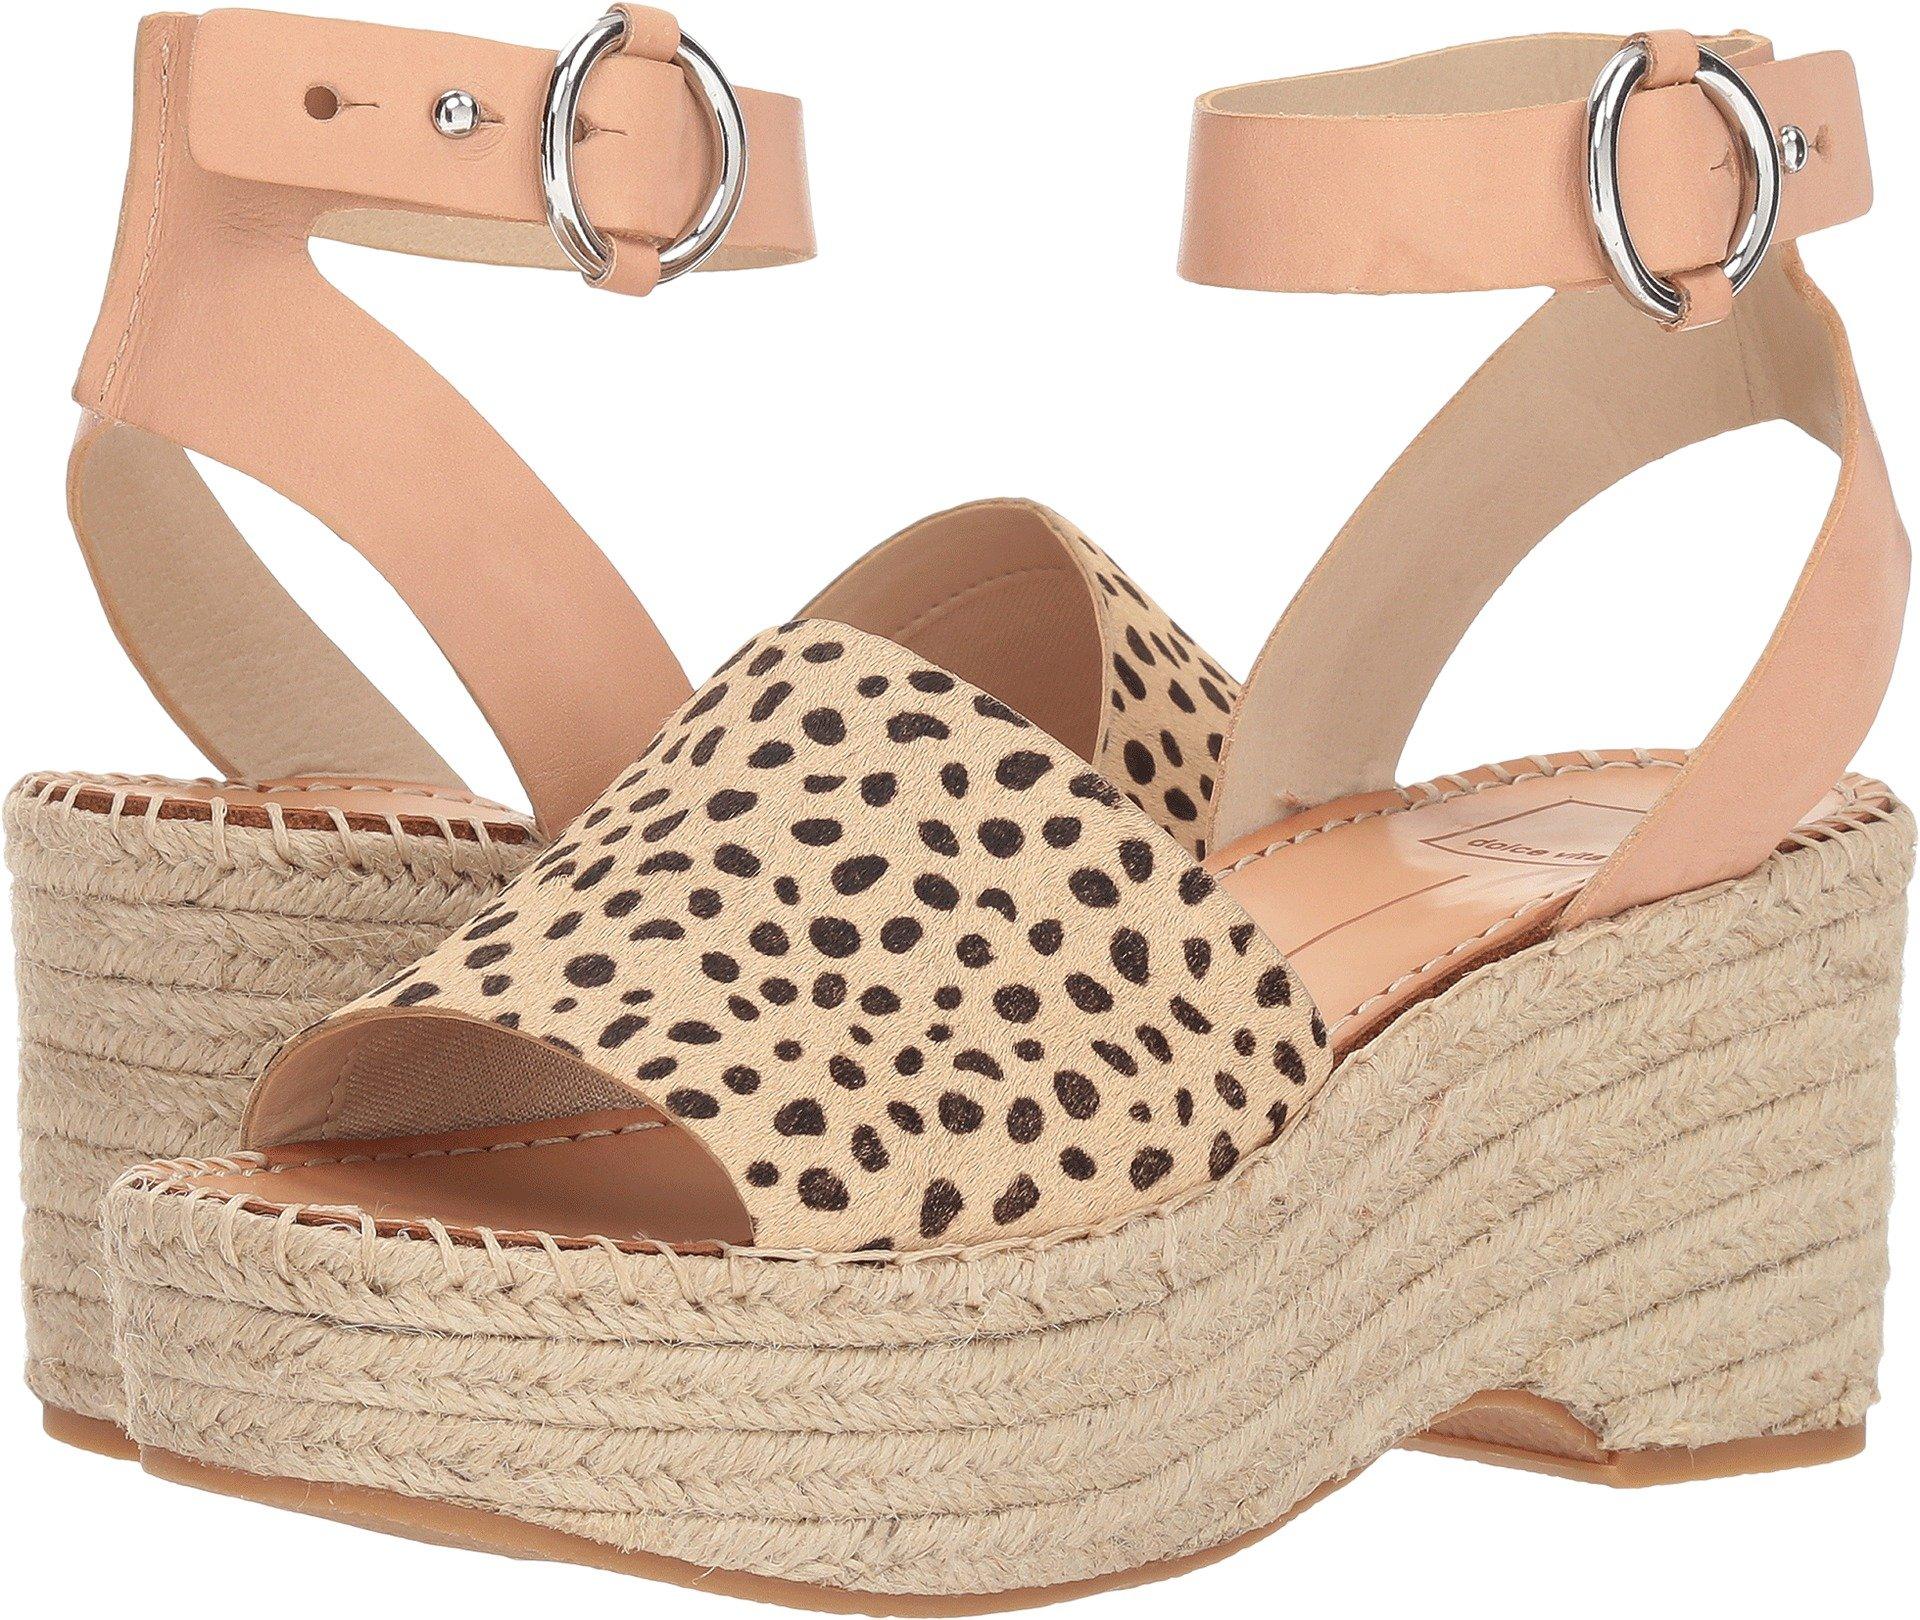 449f6526a8 Galleon - Dolce Vita Women's Lesly Wedge Sandal, Leopard Calf Hair, 6 M US